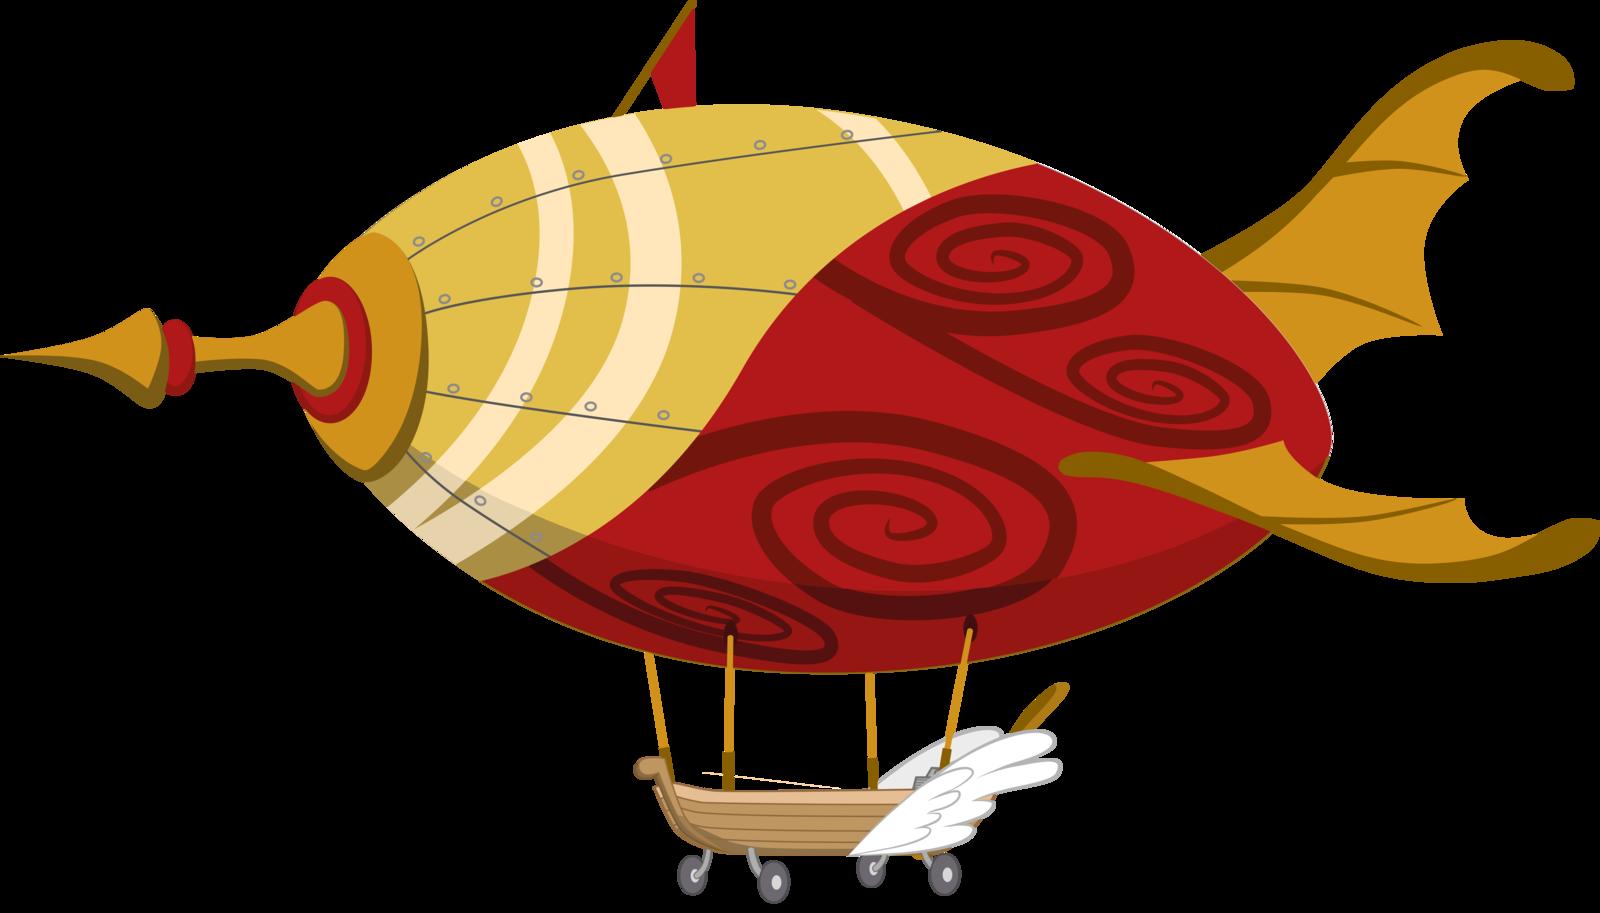 Airship Png Clipart - Transparent Steampunk Airship Png, Png Download -  kindpng